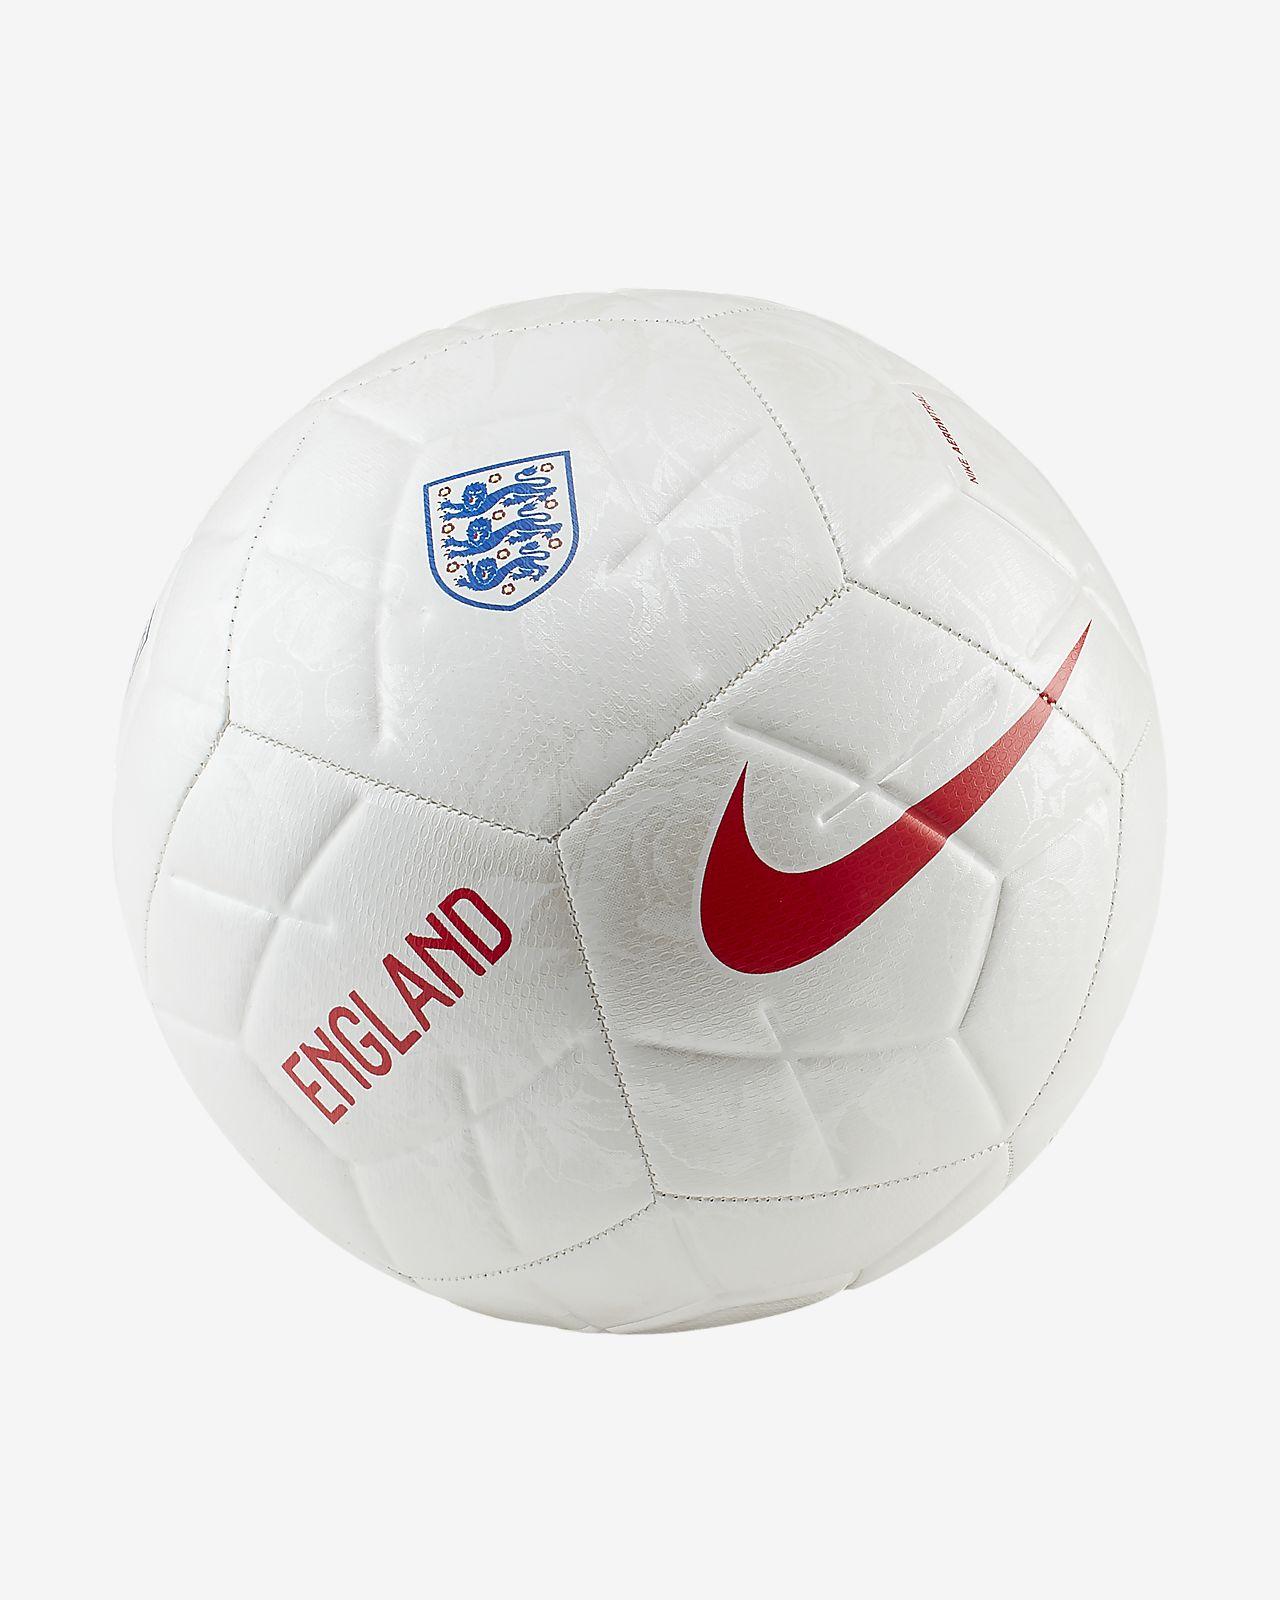 Piłka do piłki nożnej England Strike